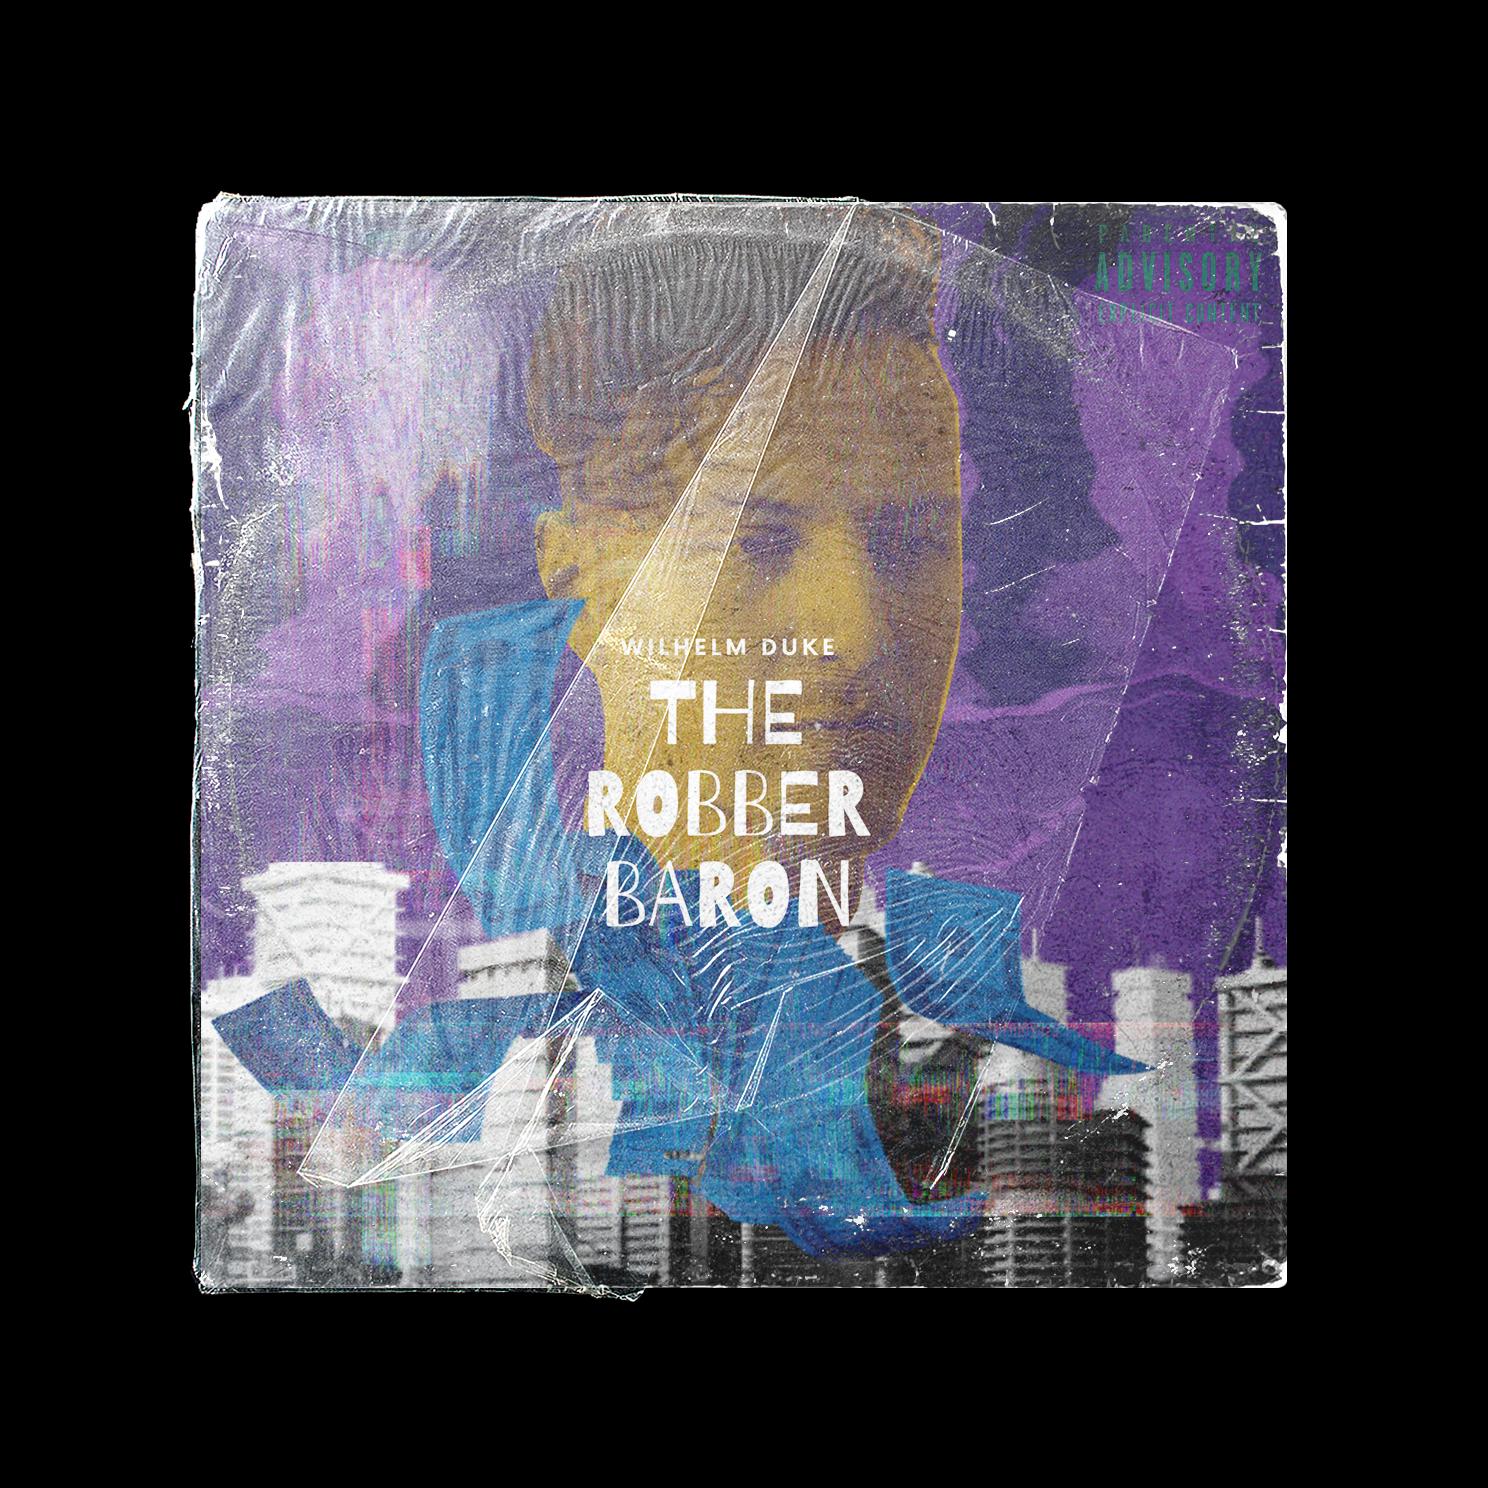 The Robber Baron Album #2